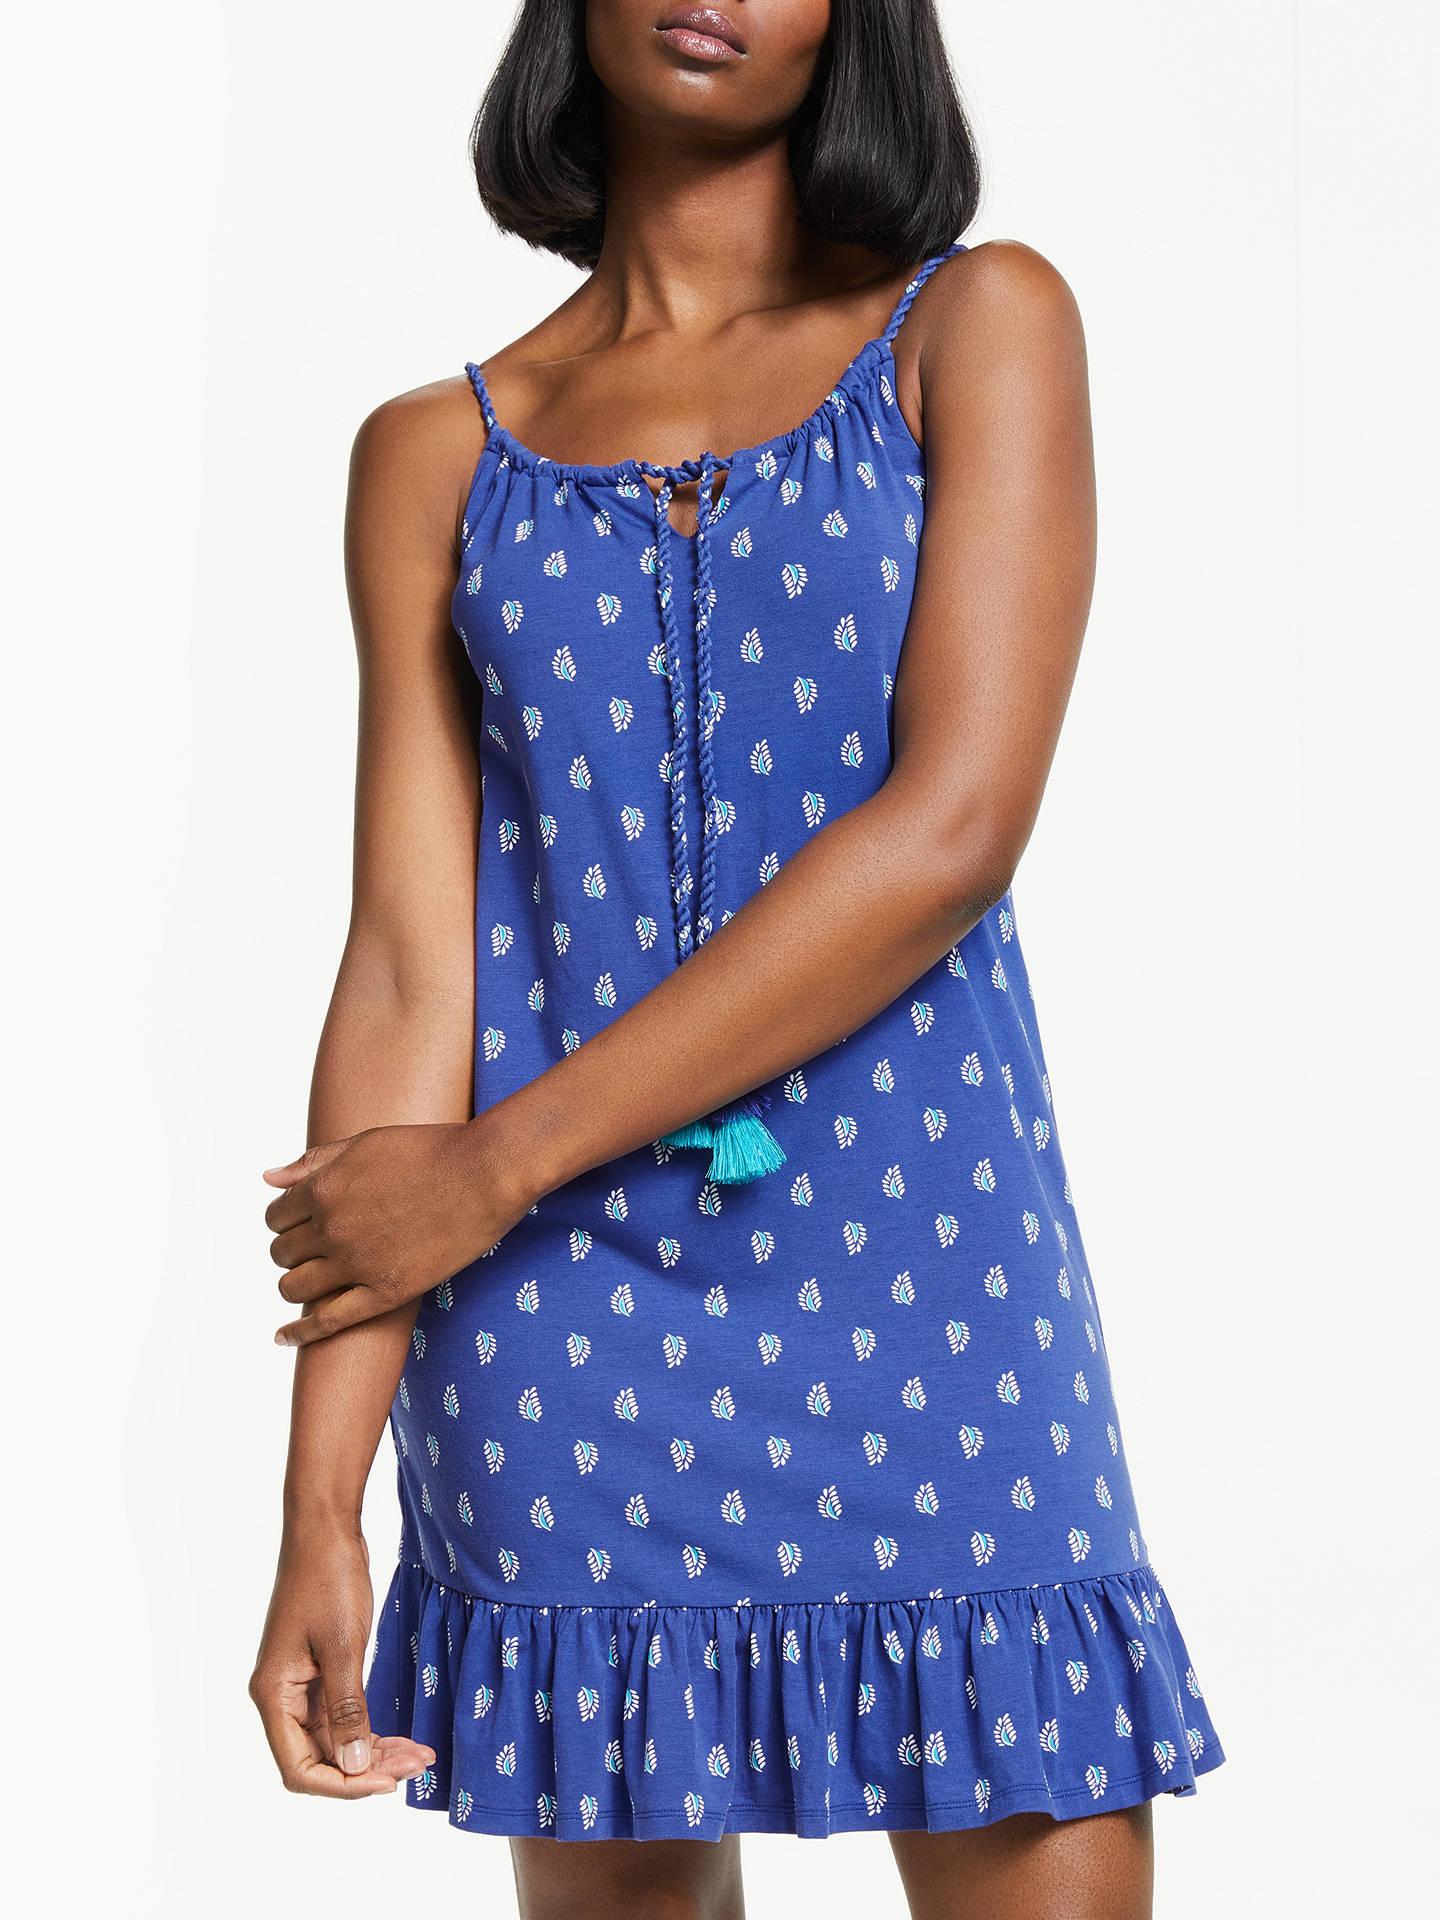 dc39802ae96 Buy Boden Sophia Jersey Dress, Lapis Blue Stamp, 12 Online at johnlewis.com  ...